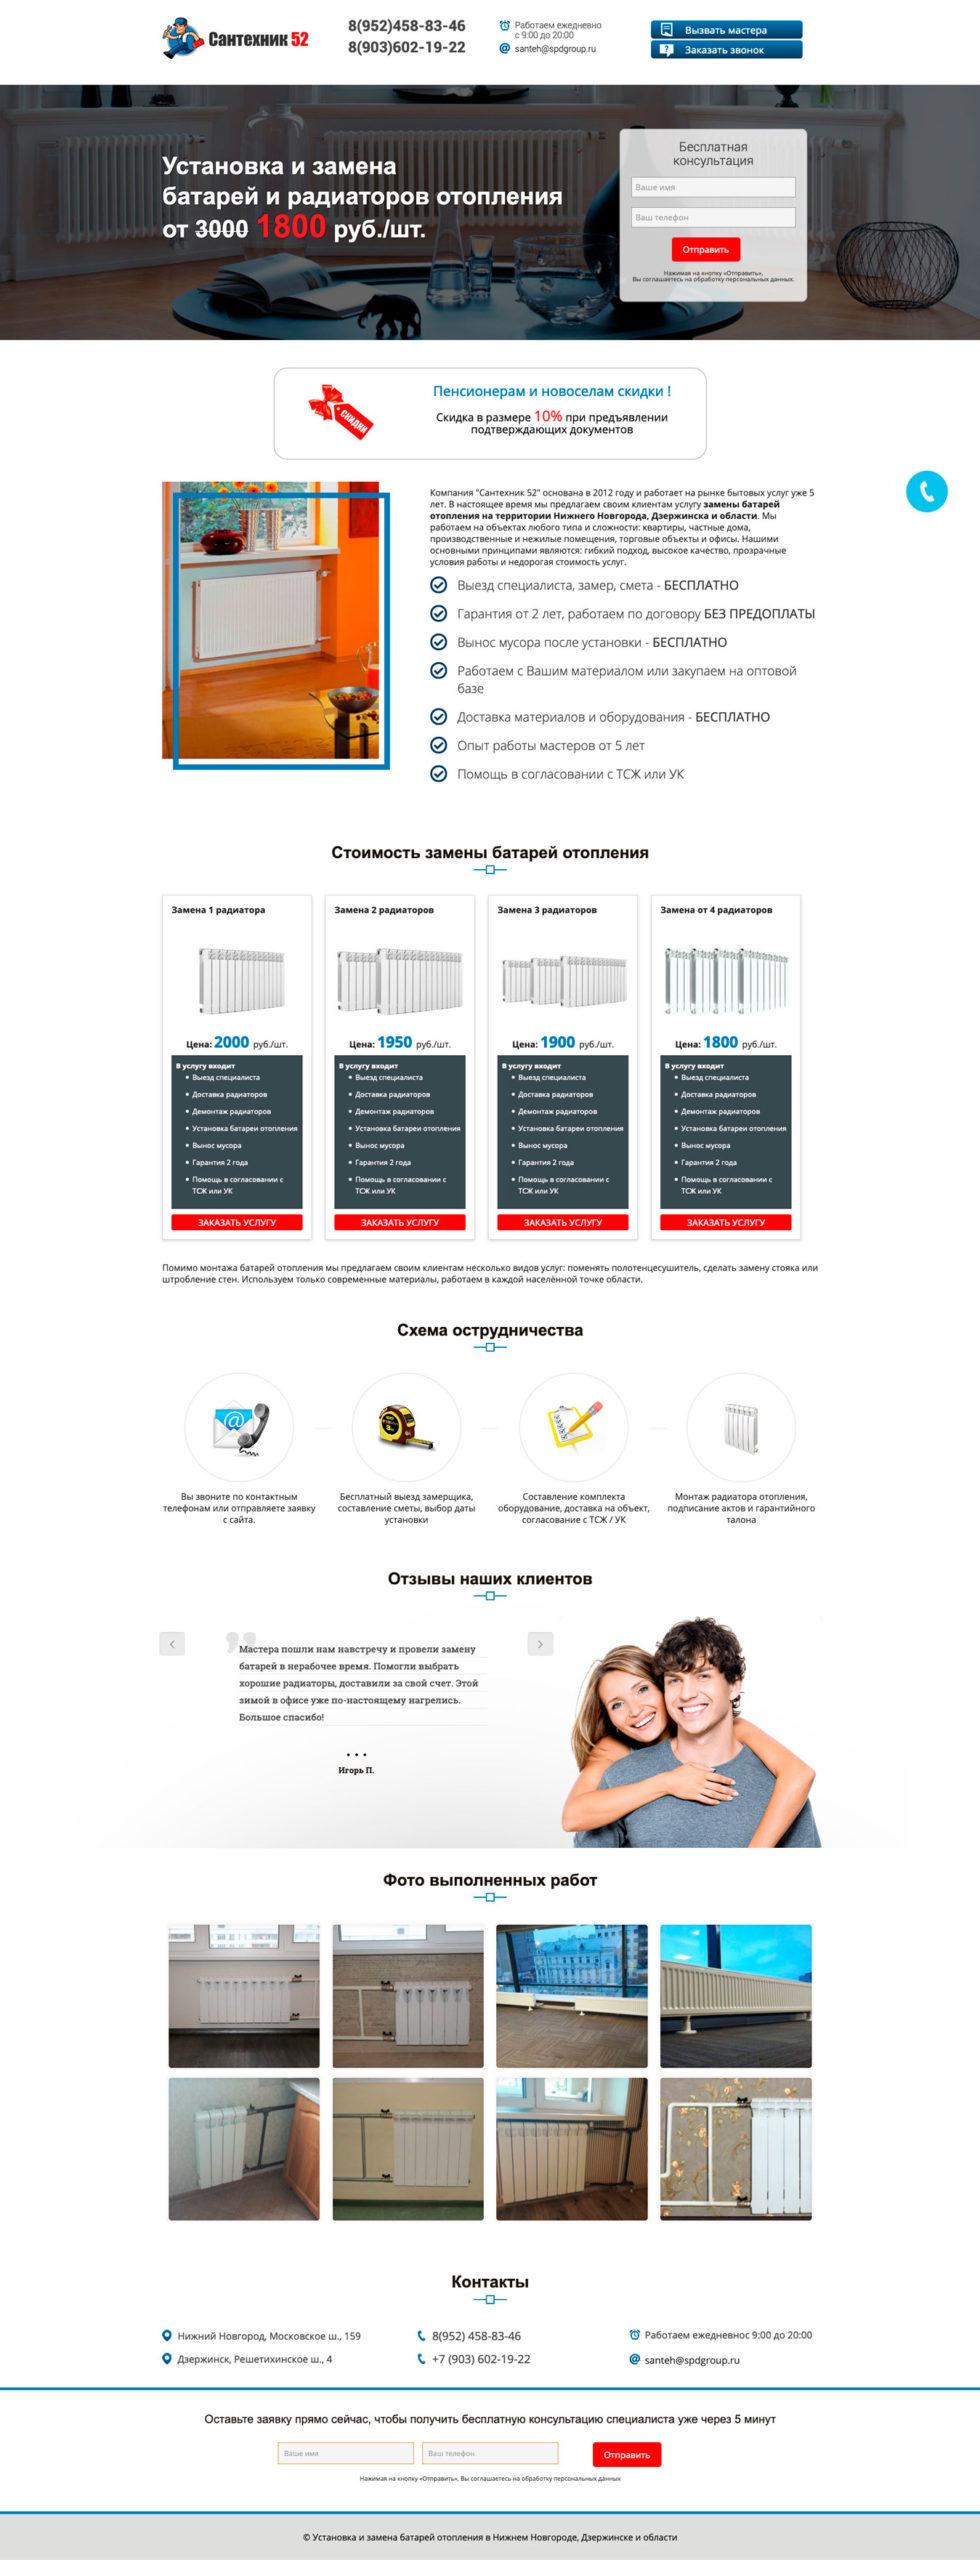 Сайт компании Сантехник 52